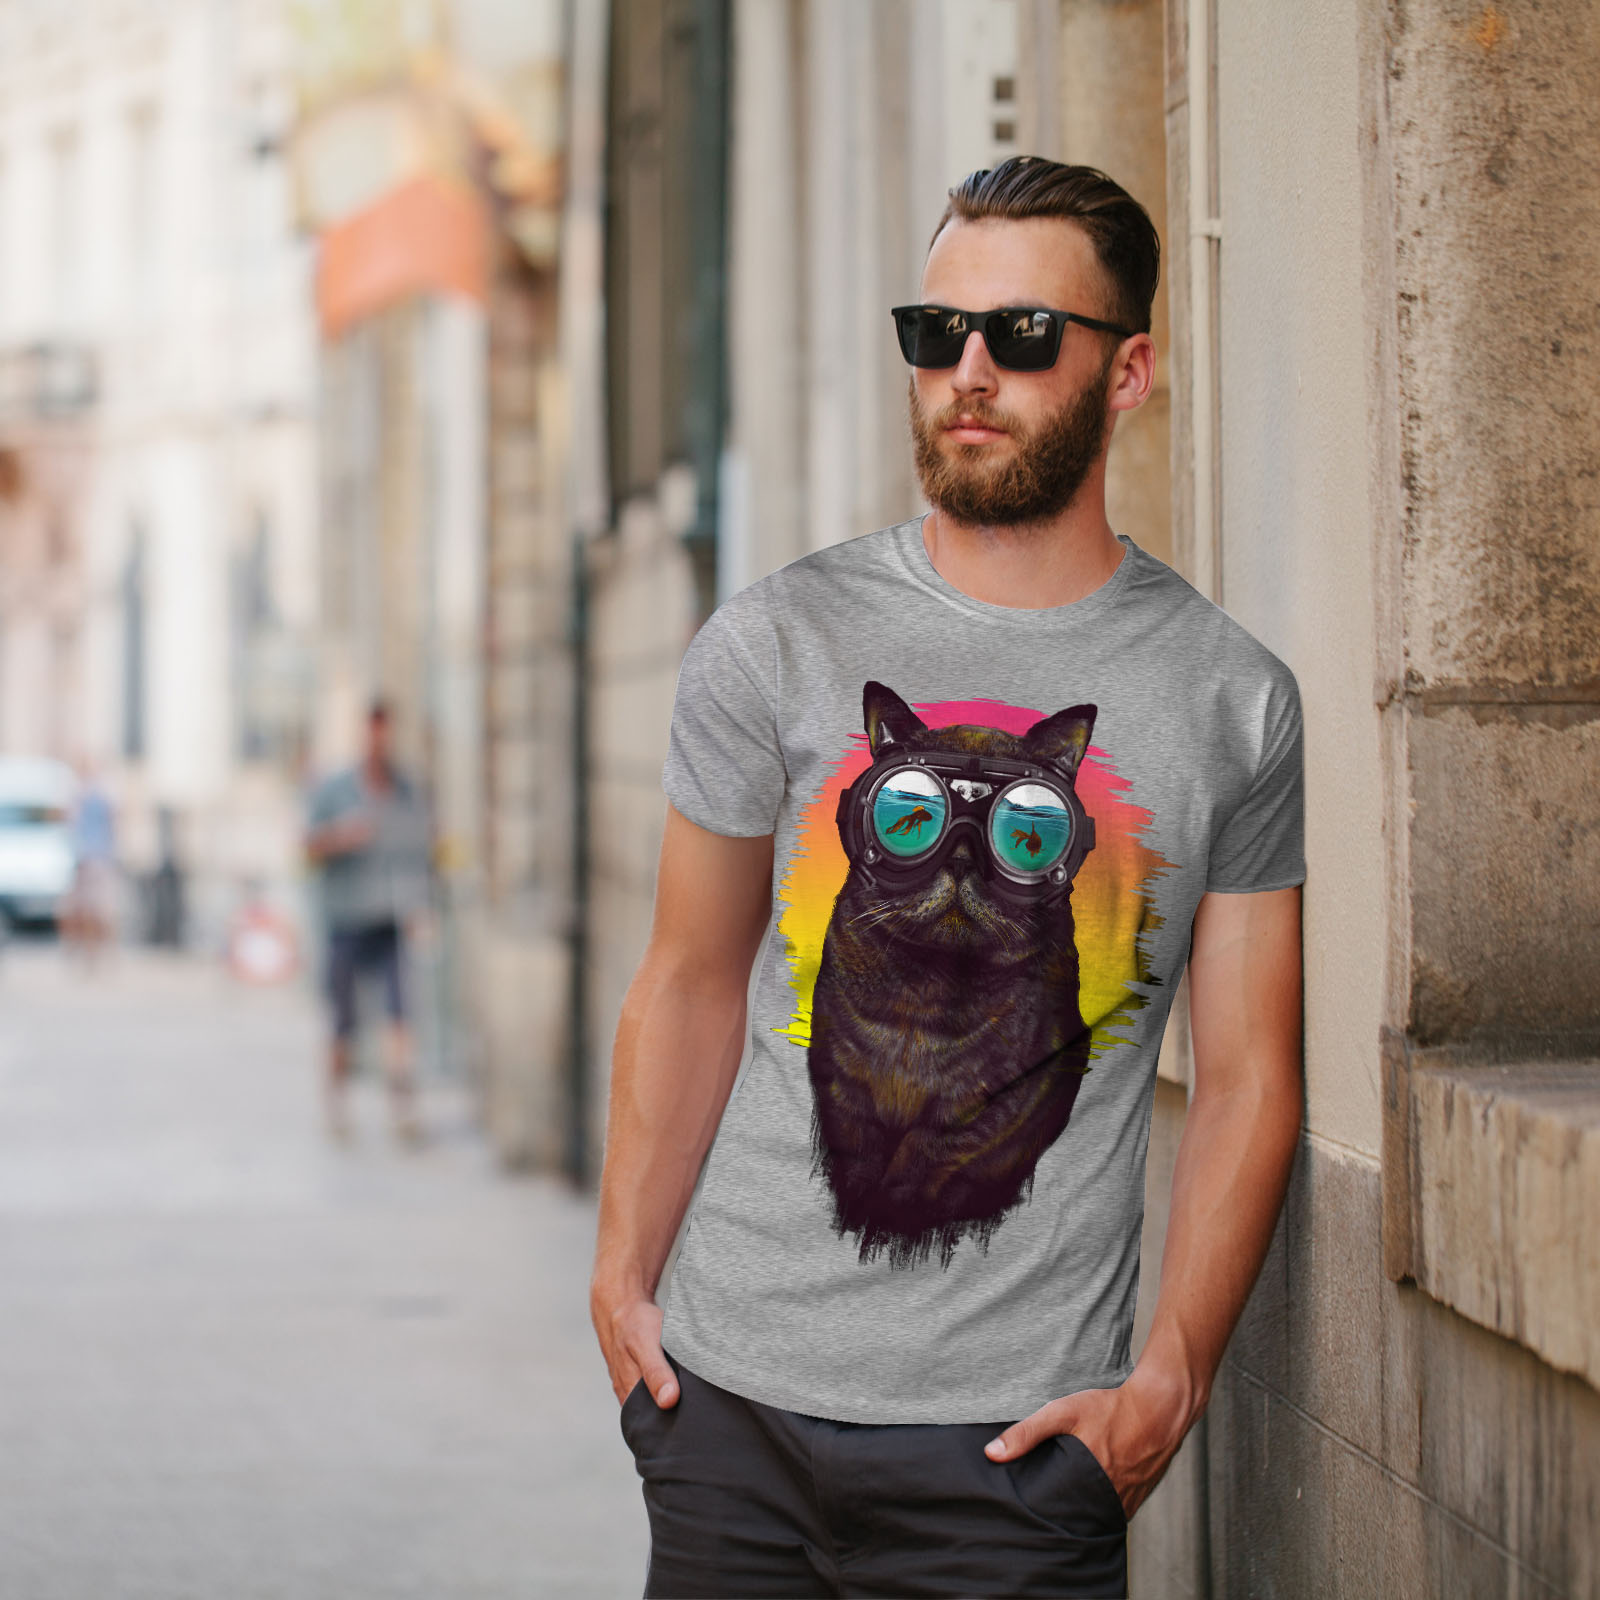 Wellcoda-Hippie-Glasses-Cool-Cat-Mens-T-shirt-Fish-Graphic-Design-Printed-Tee thumbnail 17